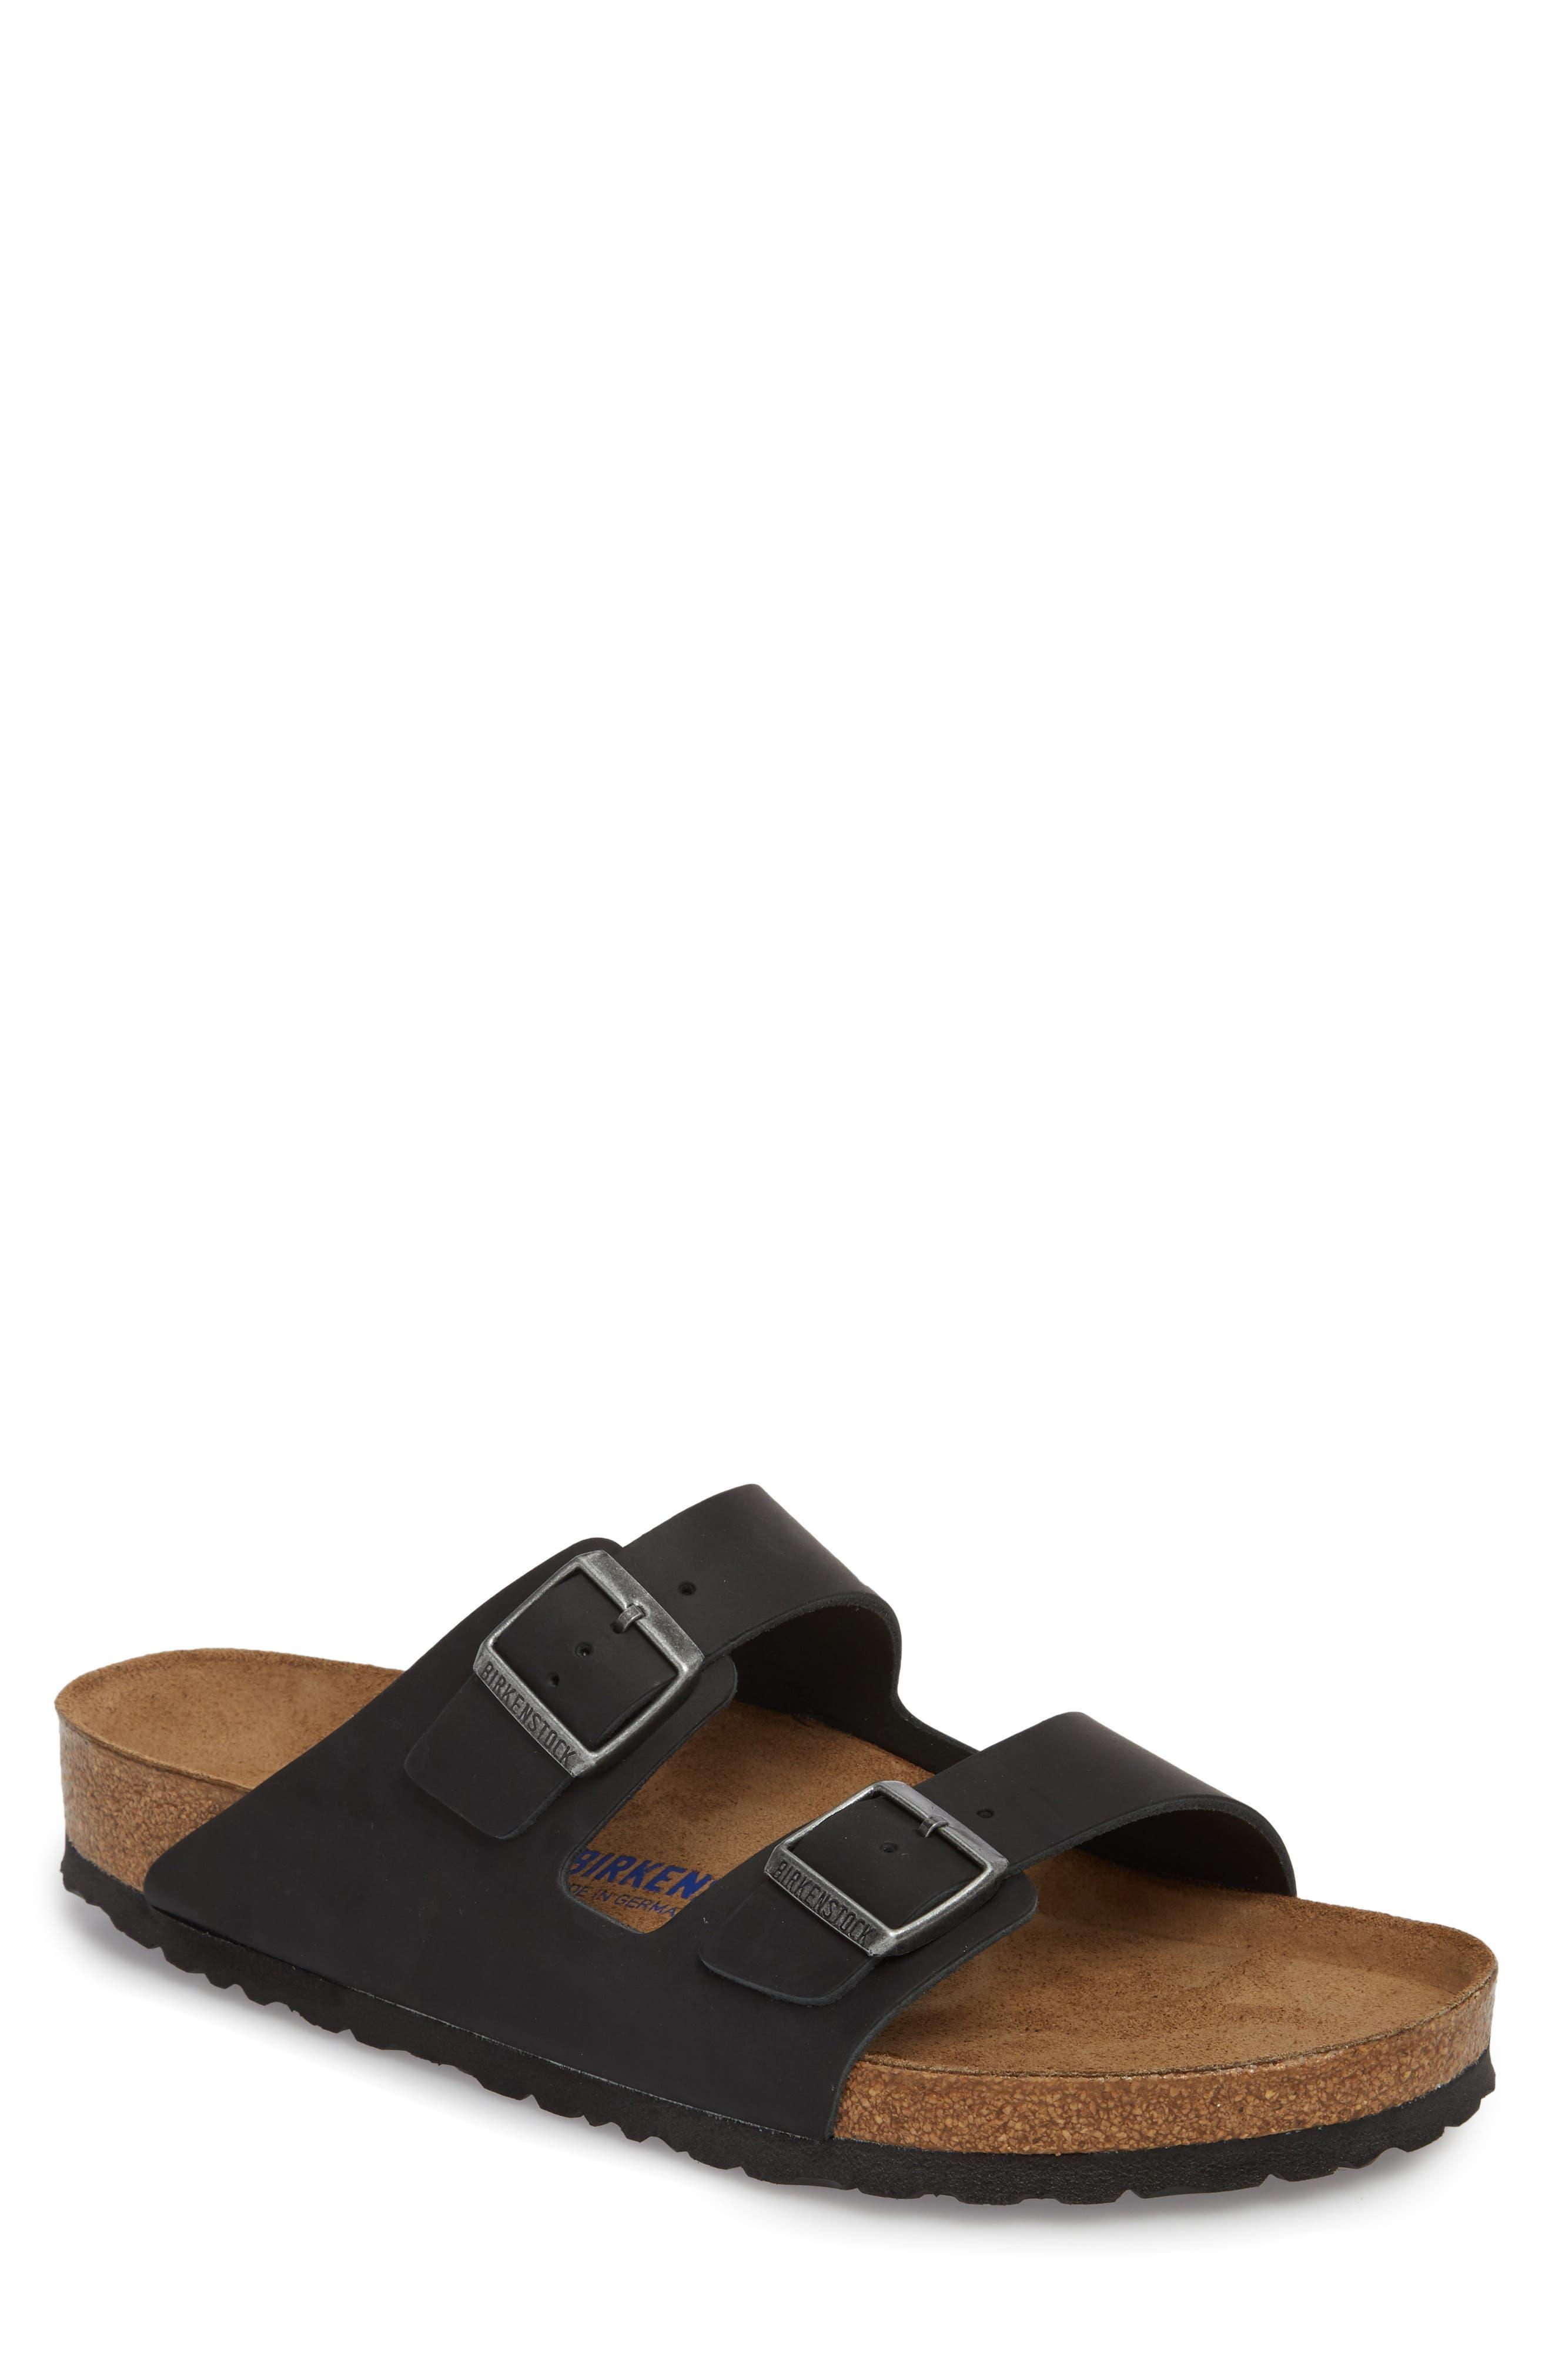 Birkenstock Arizona Soft Slide Sandal,7.5 - Black